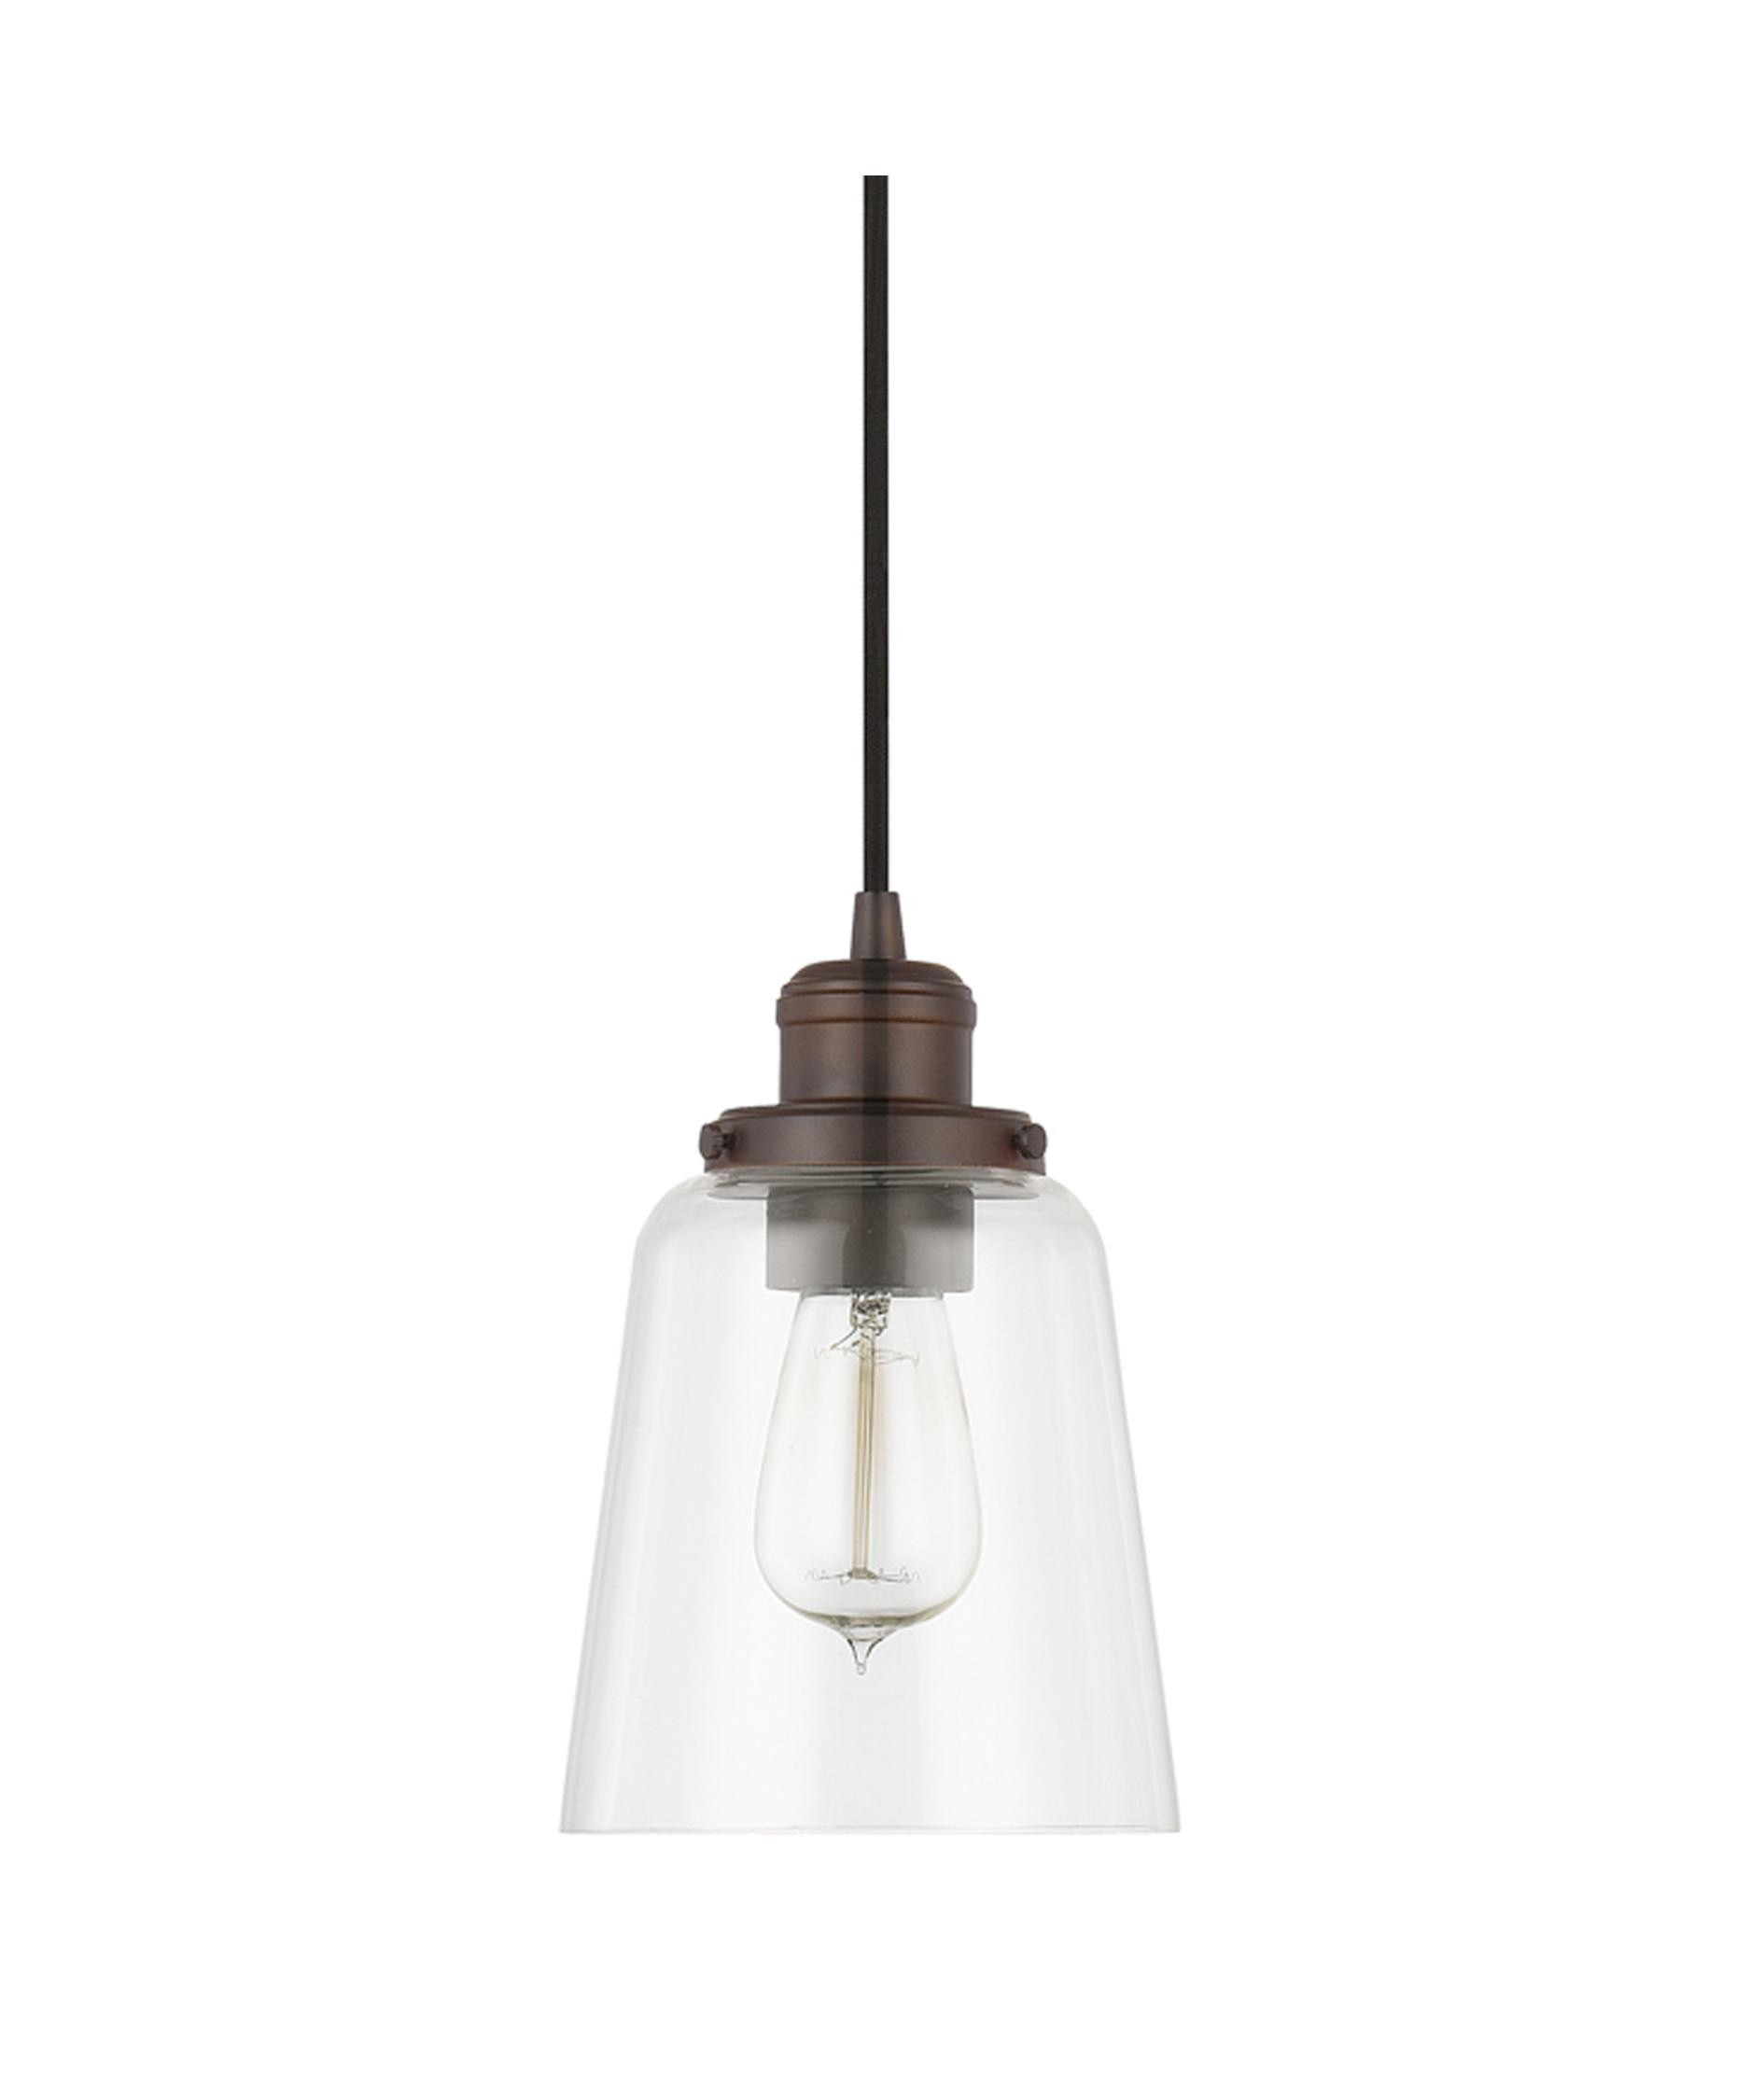 Capital Lighting 3718 6 Inch Wide 1 Light Mini Pendant | Capitol Lighting  1 800lighting.com